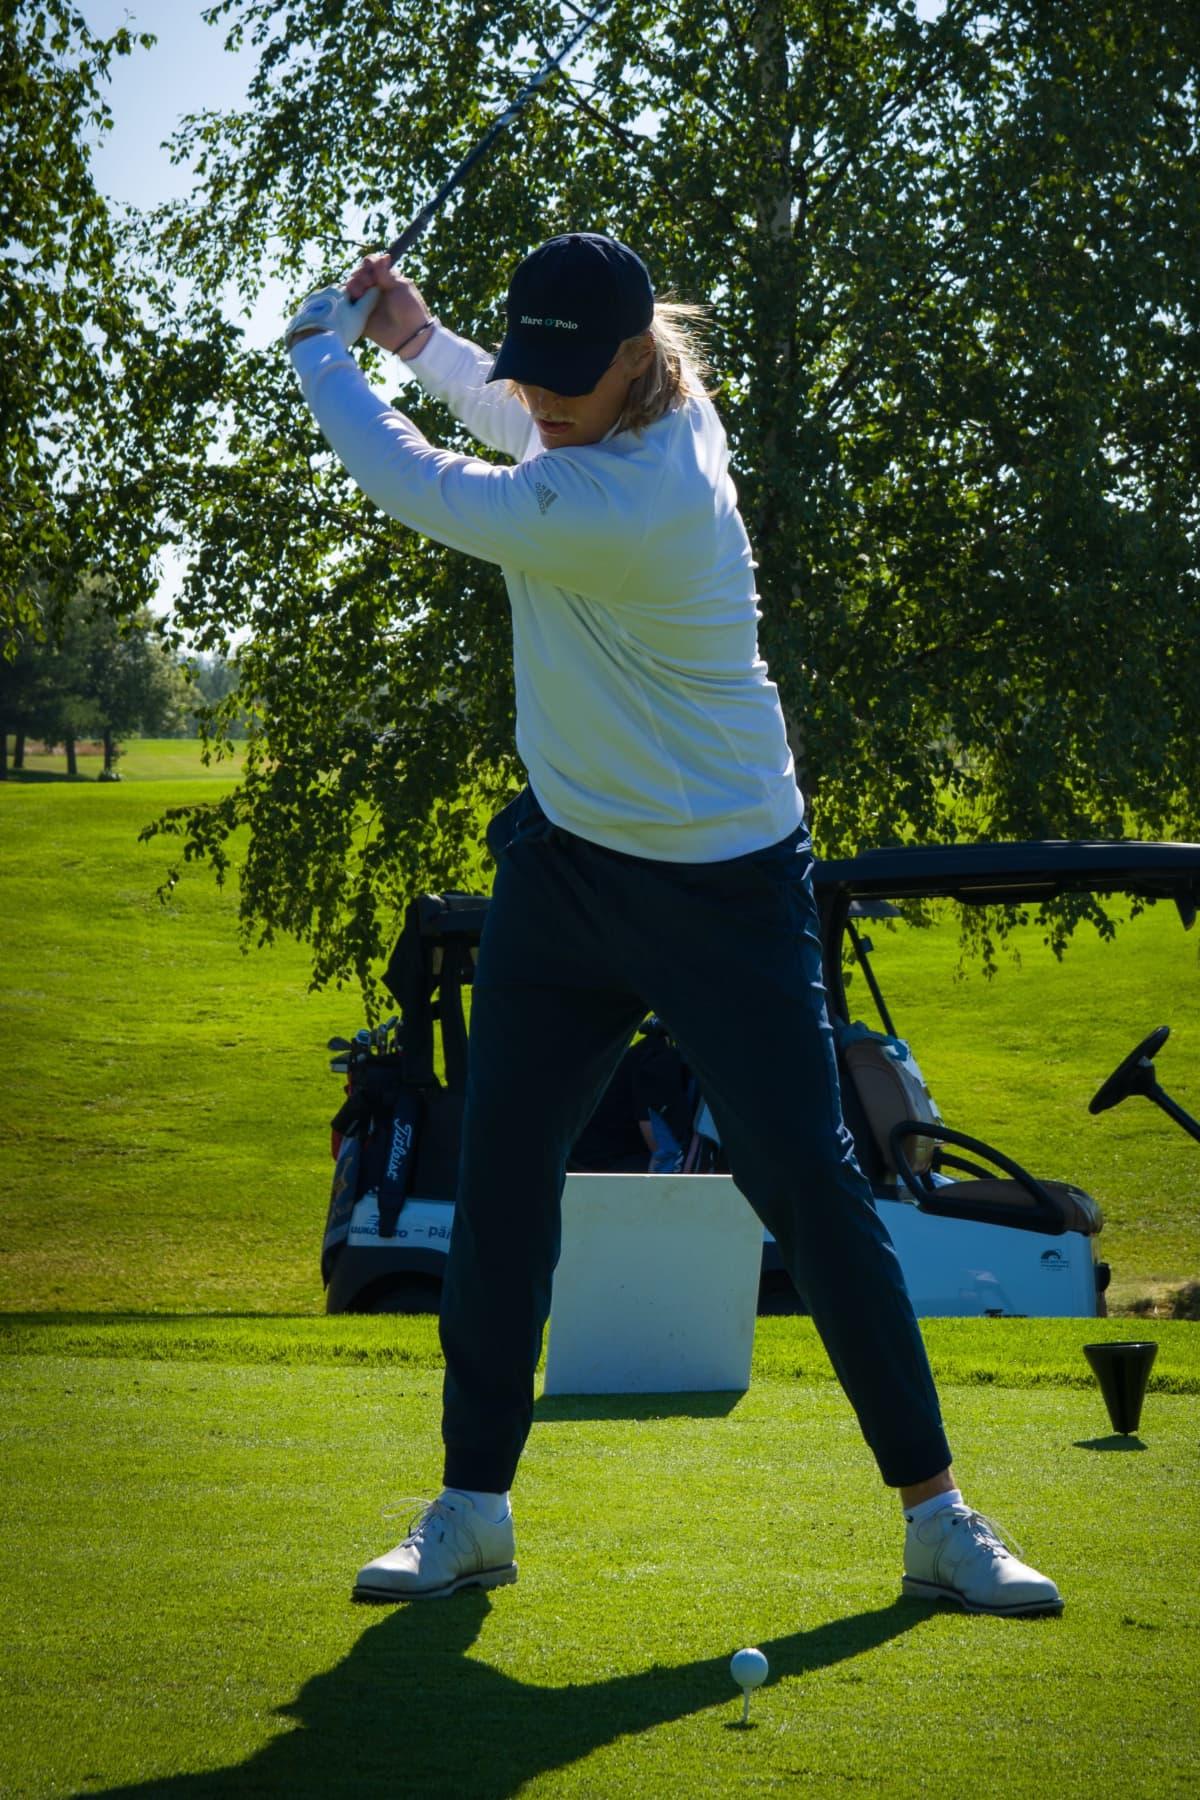 Patrik Laineen golf swing.